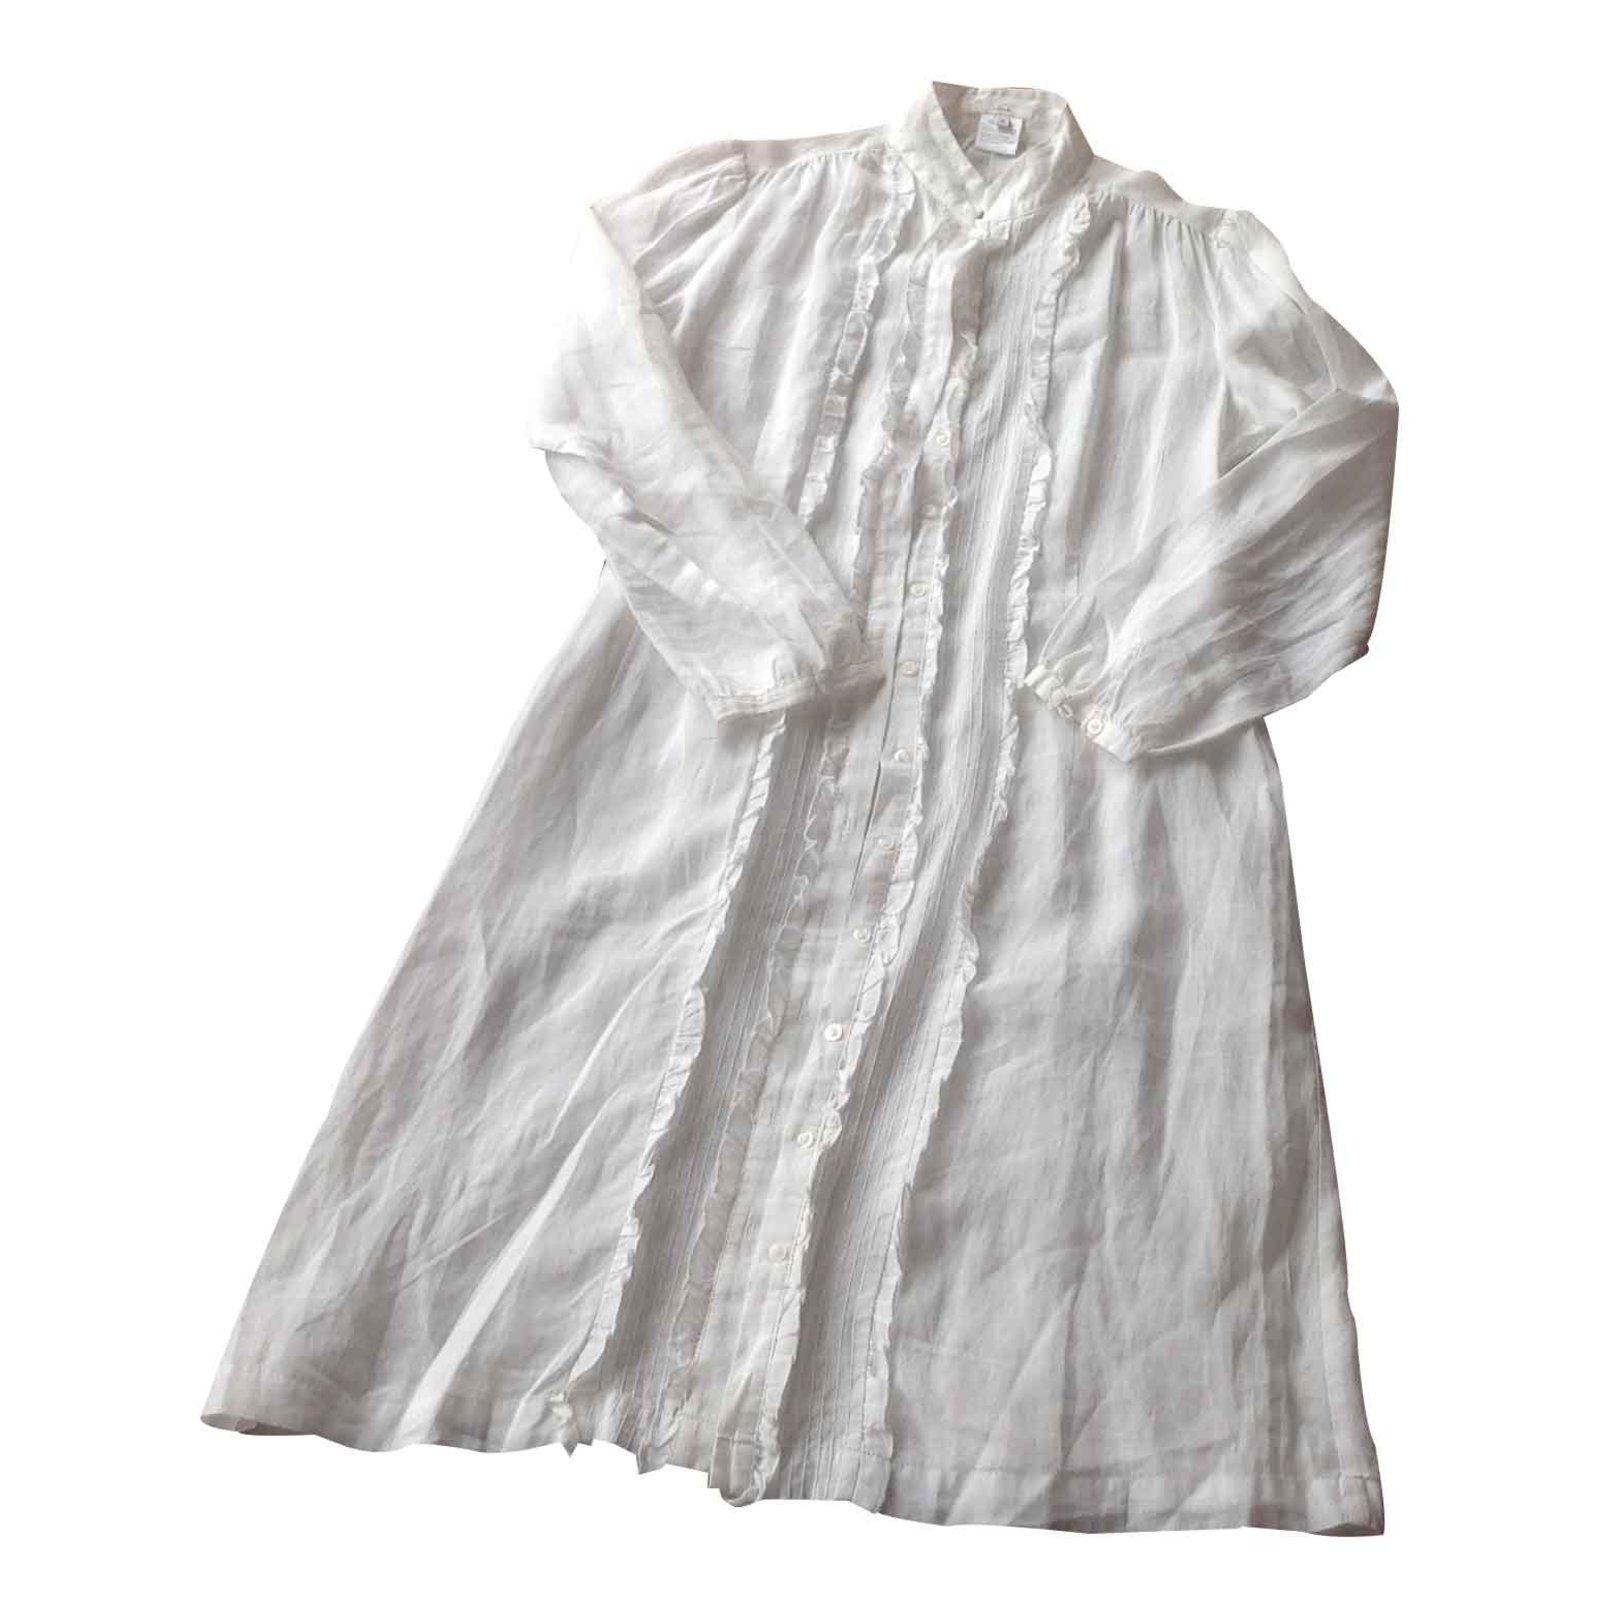 ae68396b92 Autre Marque Dress Lola Dresses Linen White ref.21346 - Joli Closet